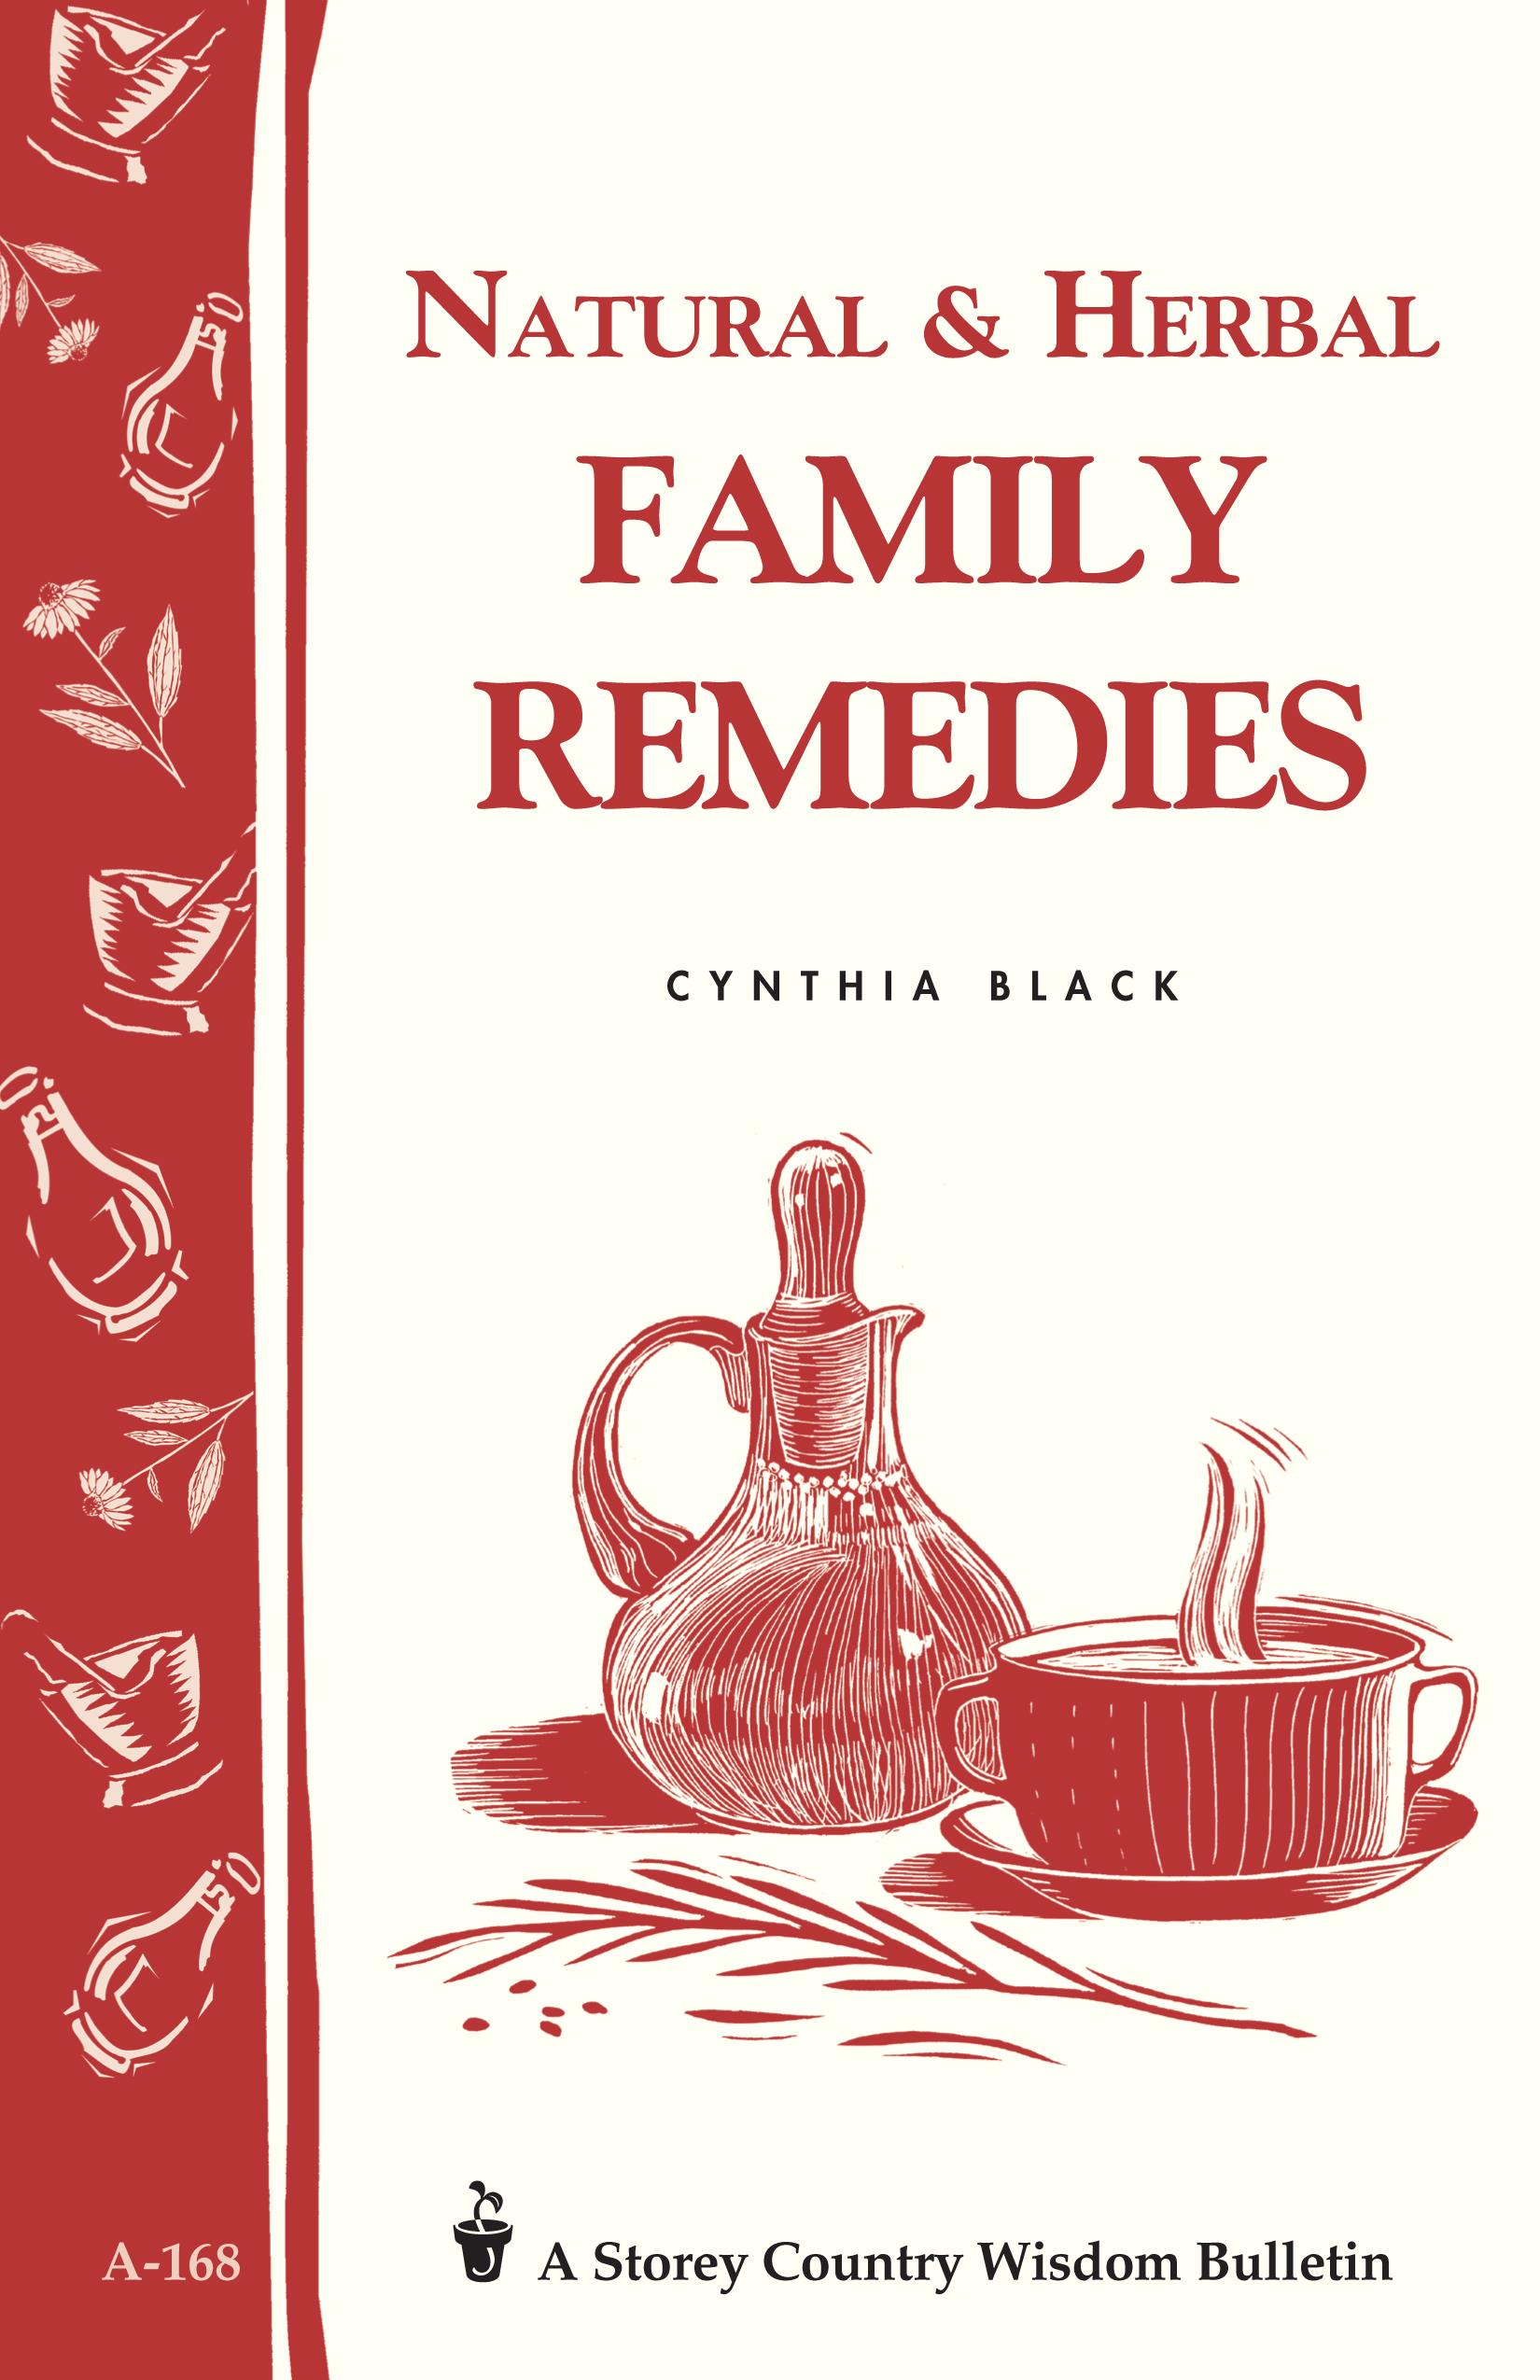 Natural & Herbal Family Remedies Storey's Country Wisdom Bulletin A-168 - Cynthia Black